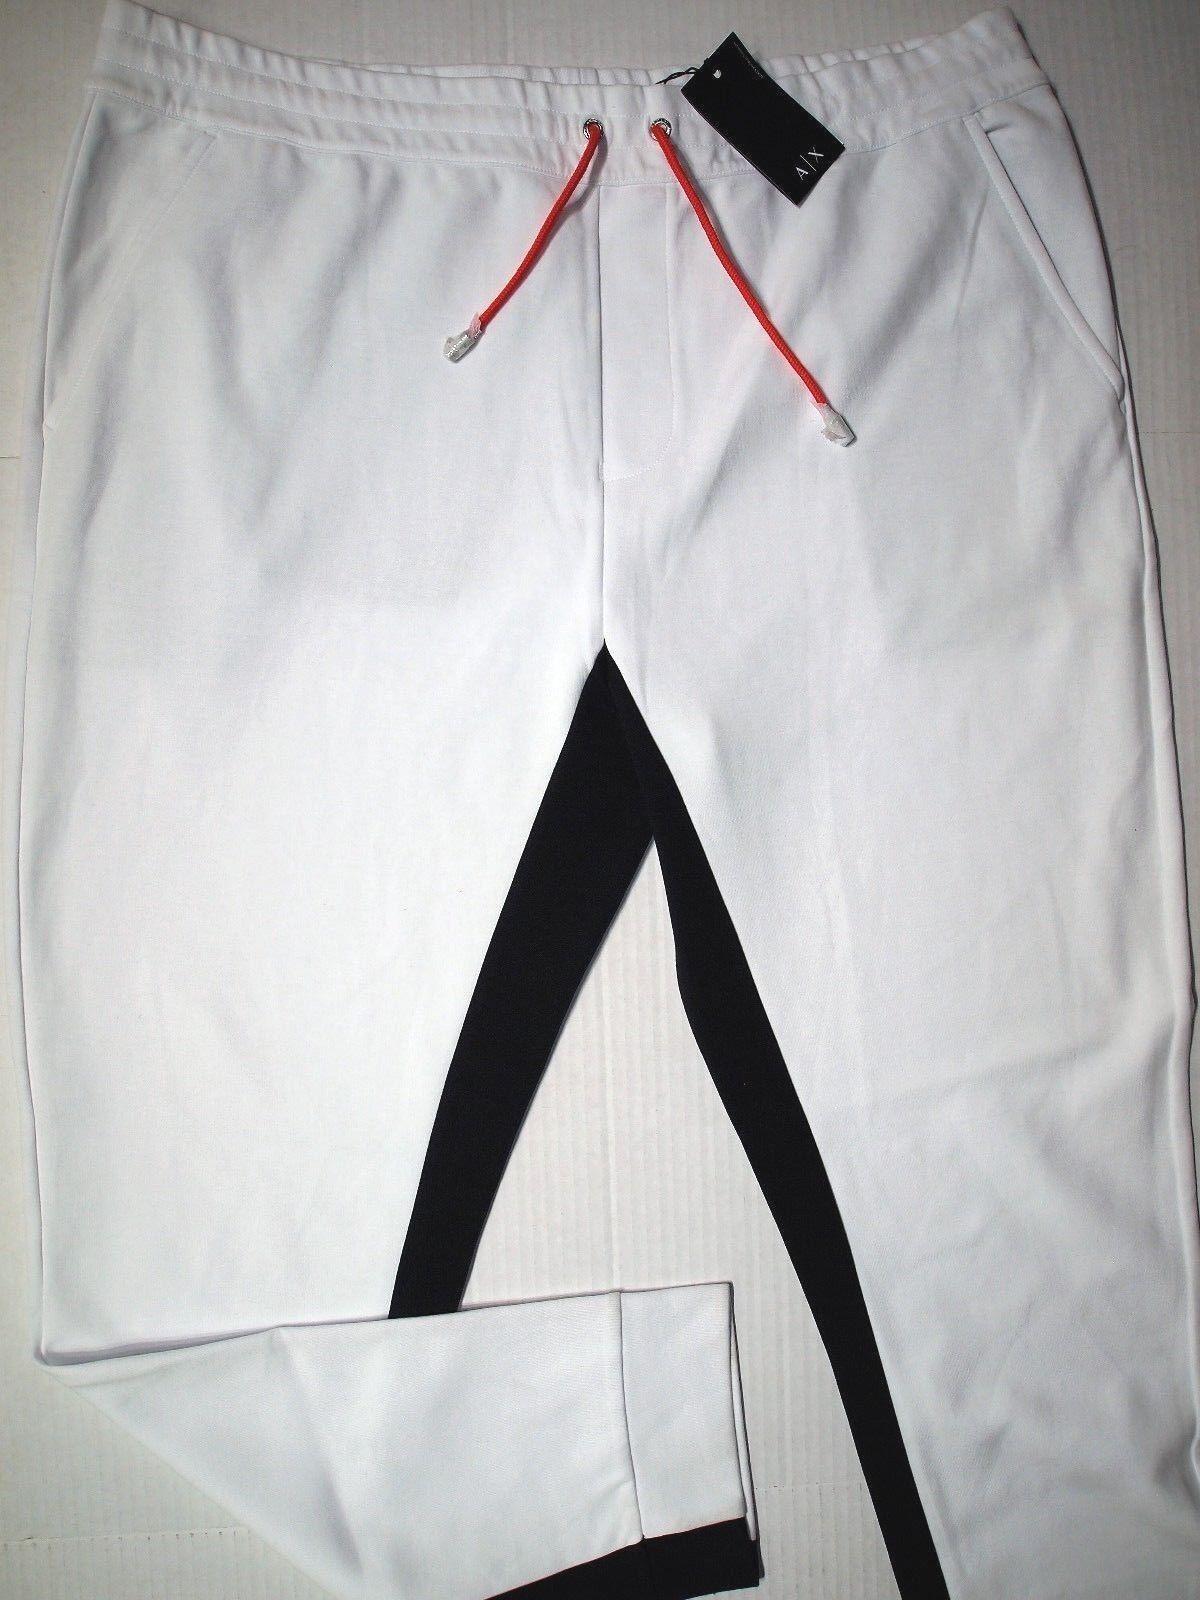 Armani Exchange men's drawstring jogger interior trim pipe size xxl color white